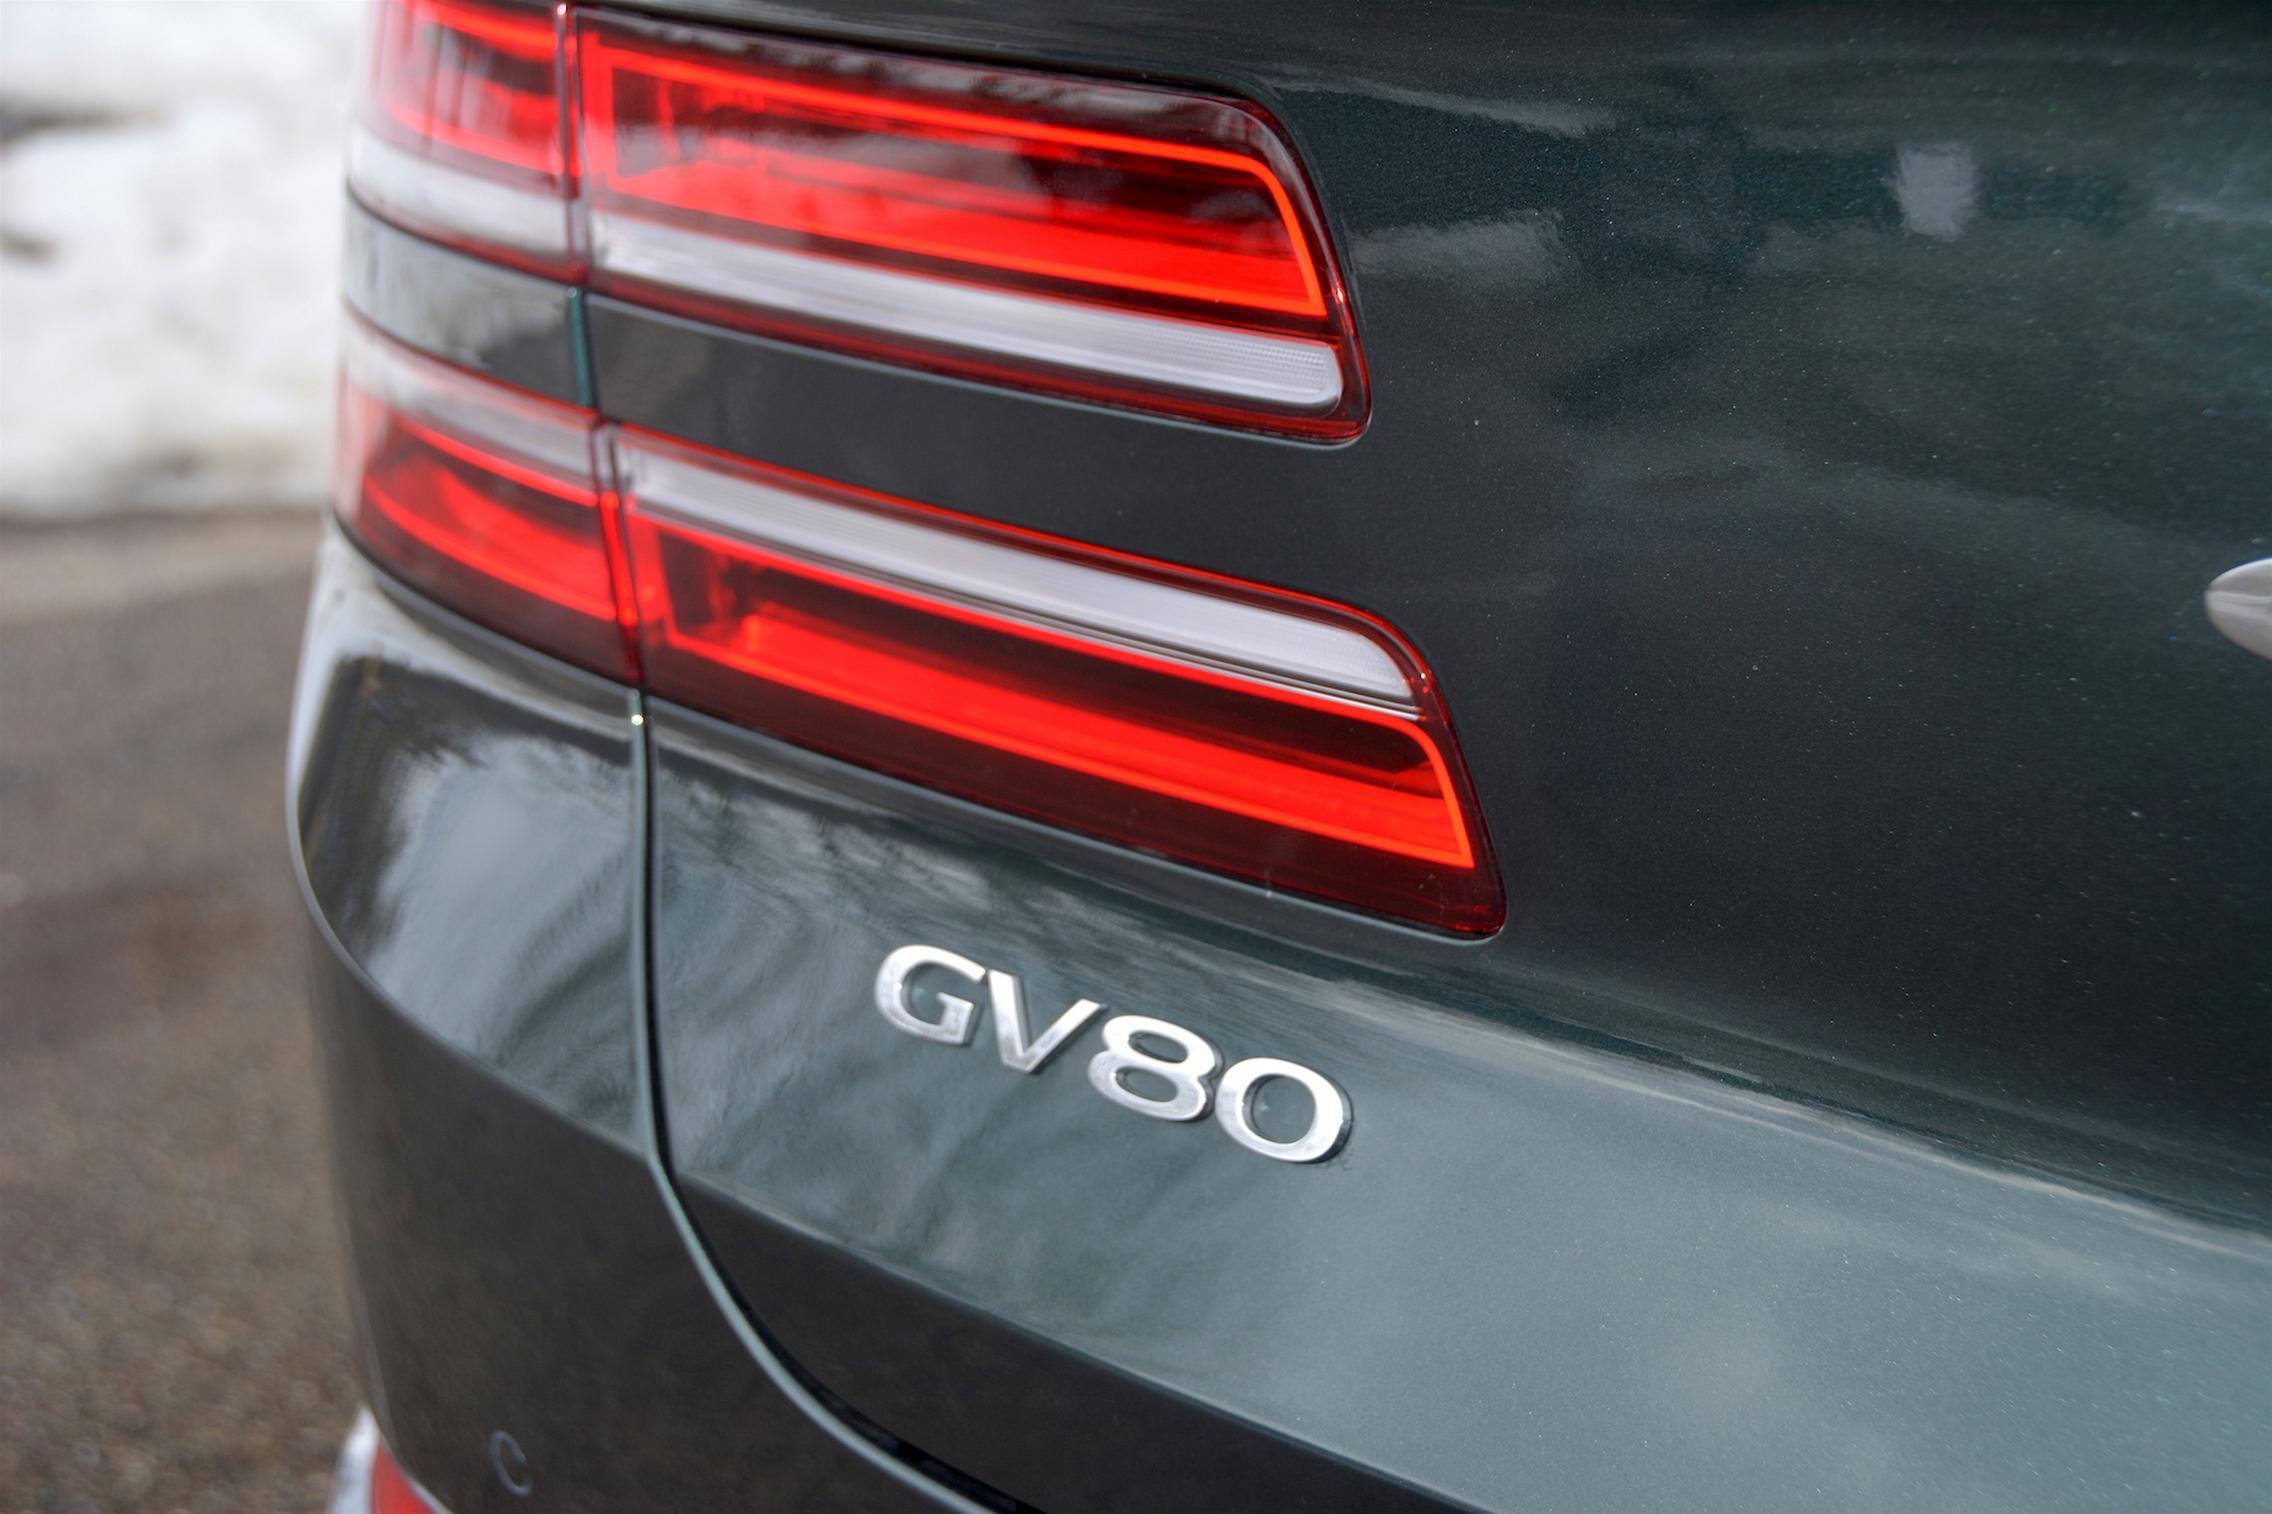 GV80 Badge